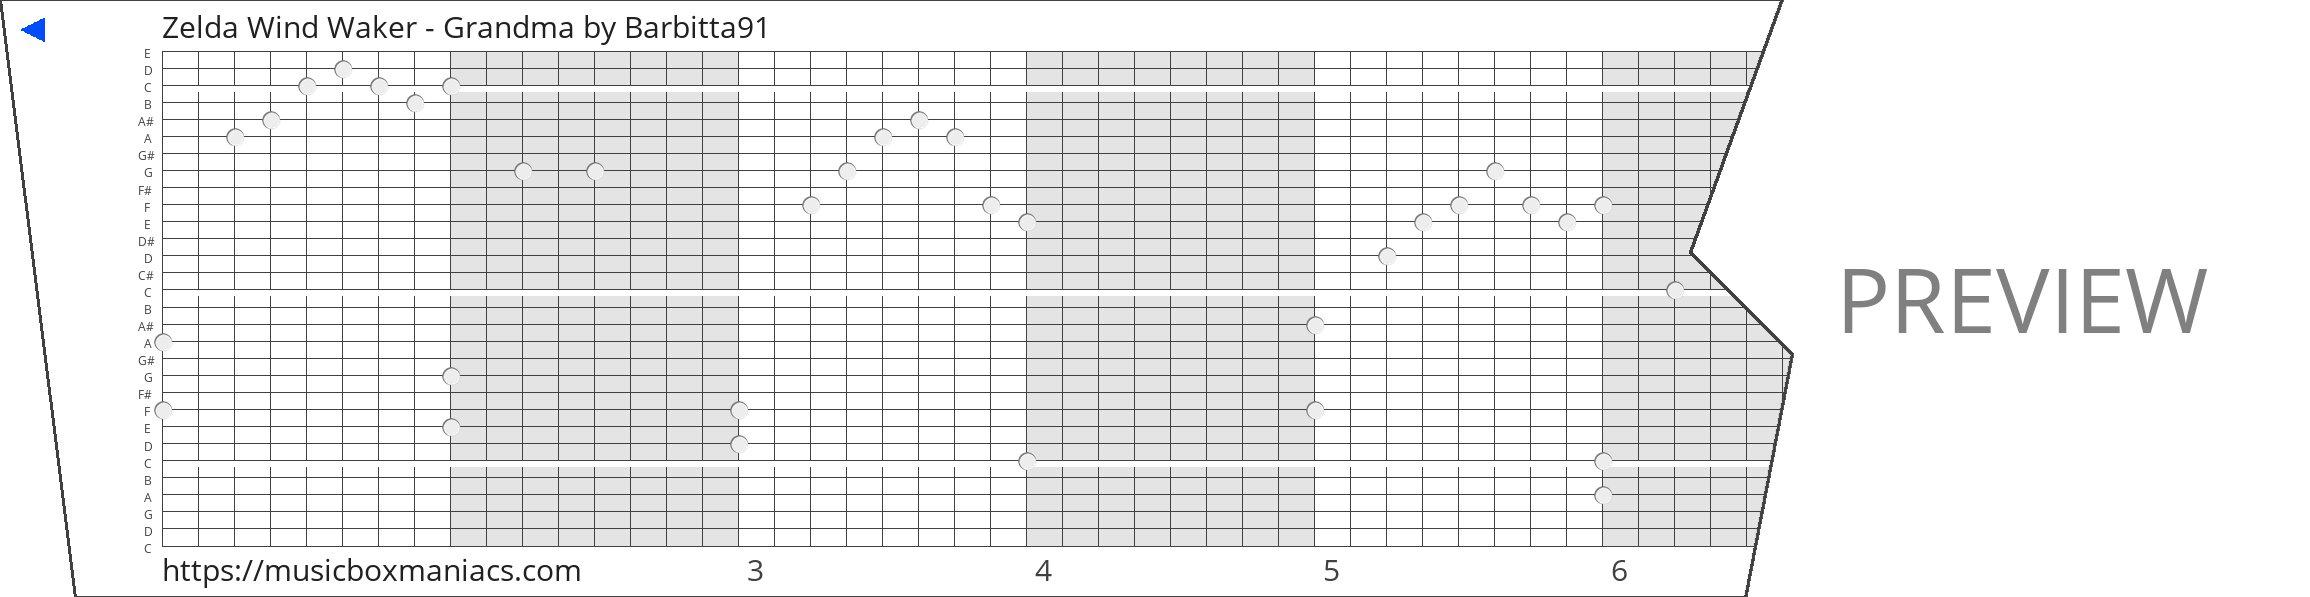 Zelda Wind Waker - Grandma 30 note music box paper strip